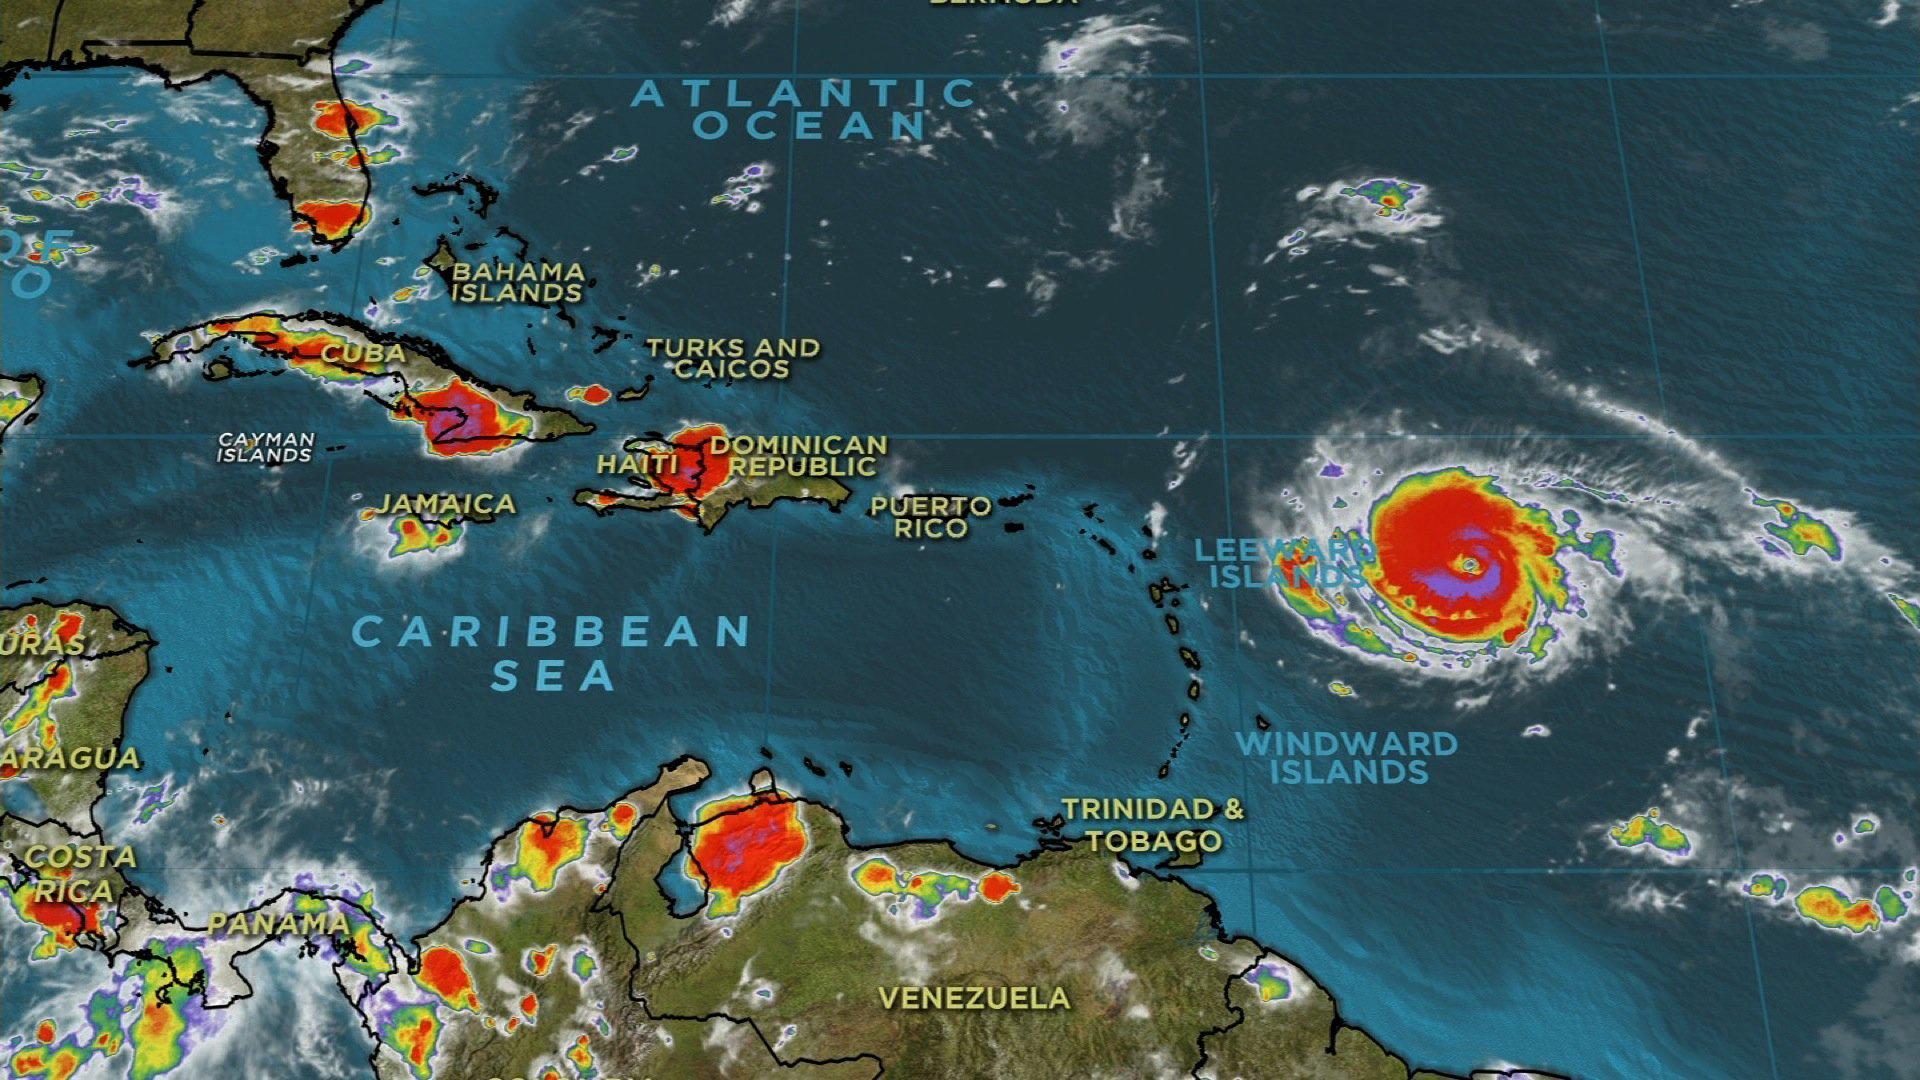 Hurricane Irma CNN map Leeward Islands-159532.jpg62448415